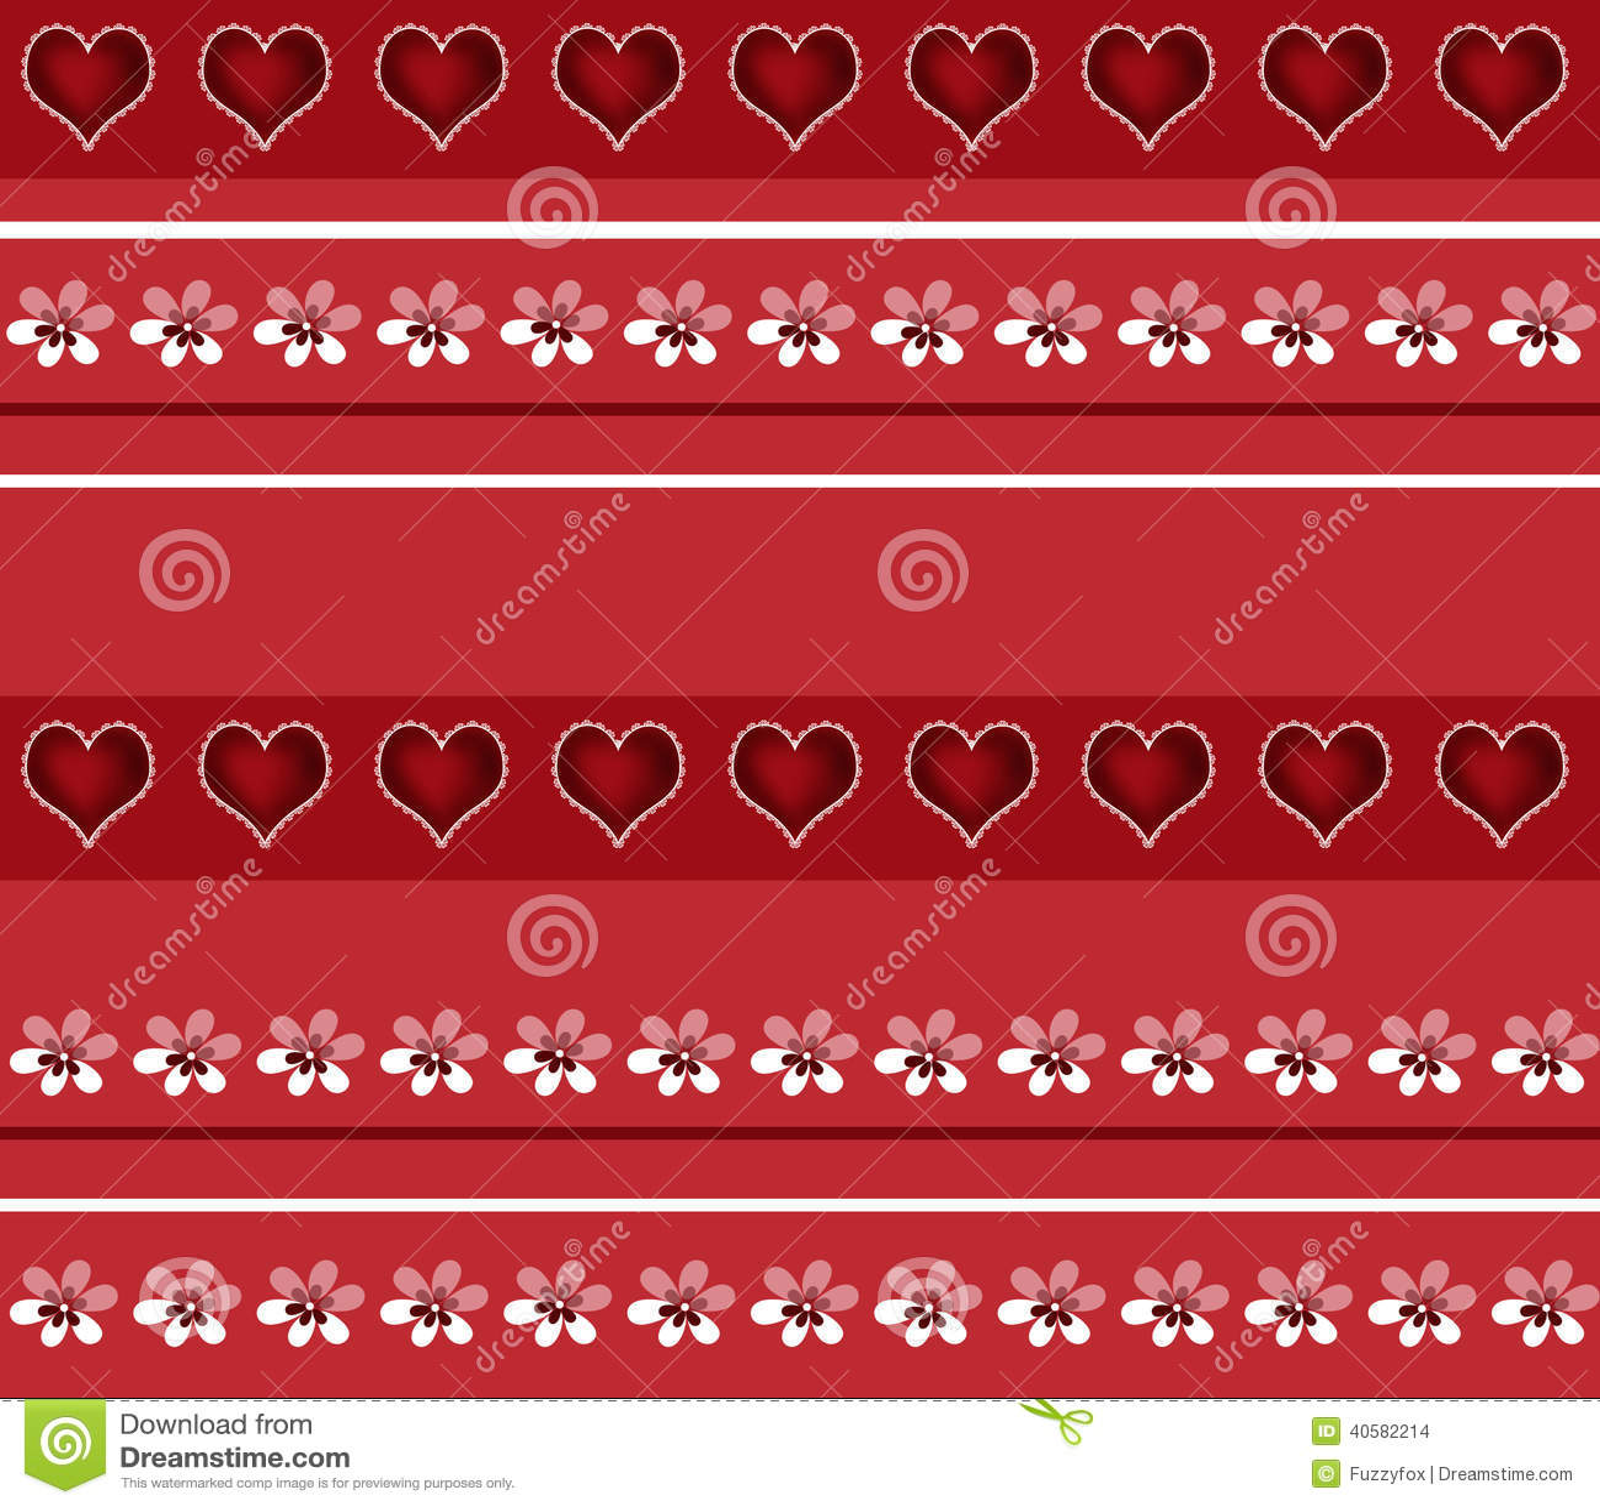 Безшовная белая картина флористических и сердец на красном цвете